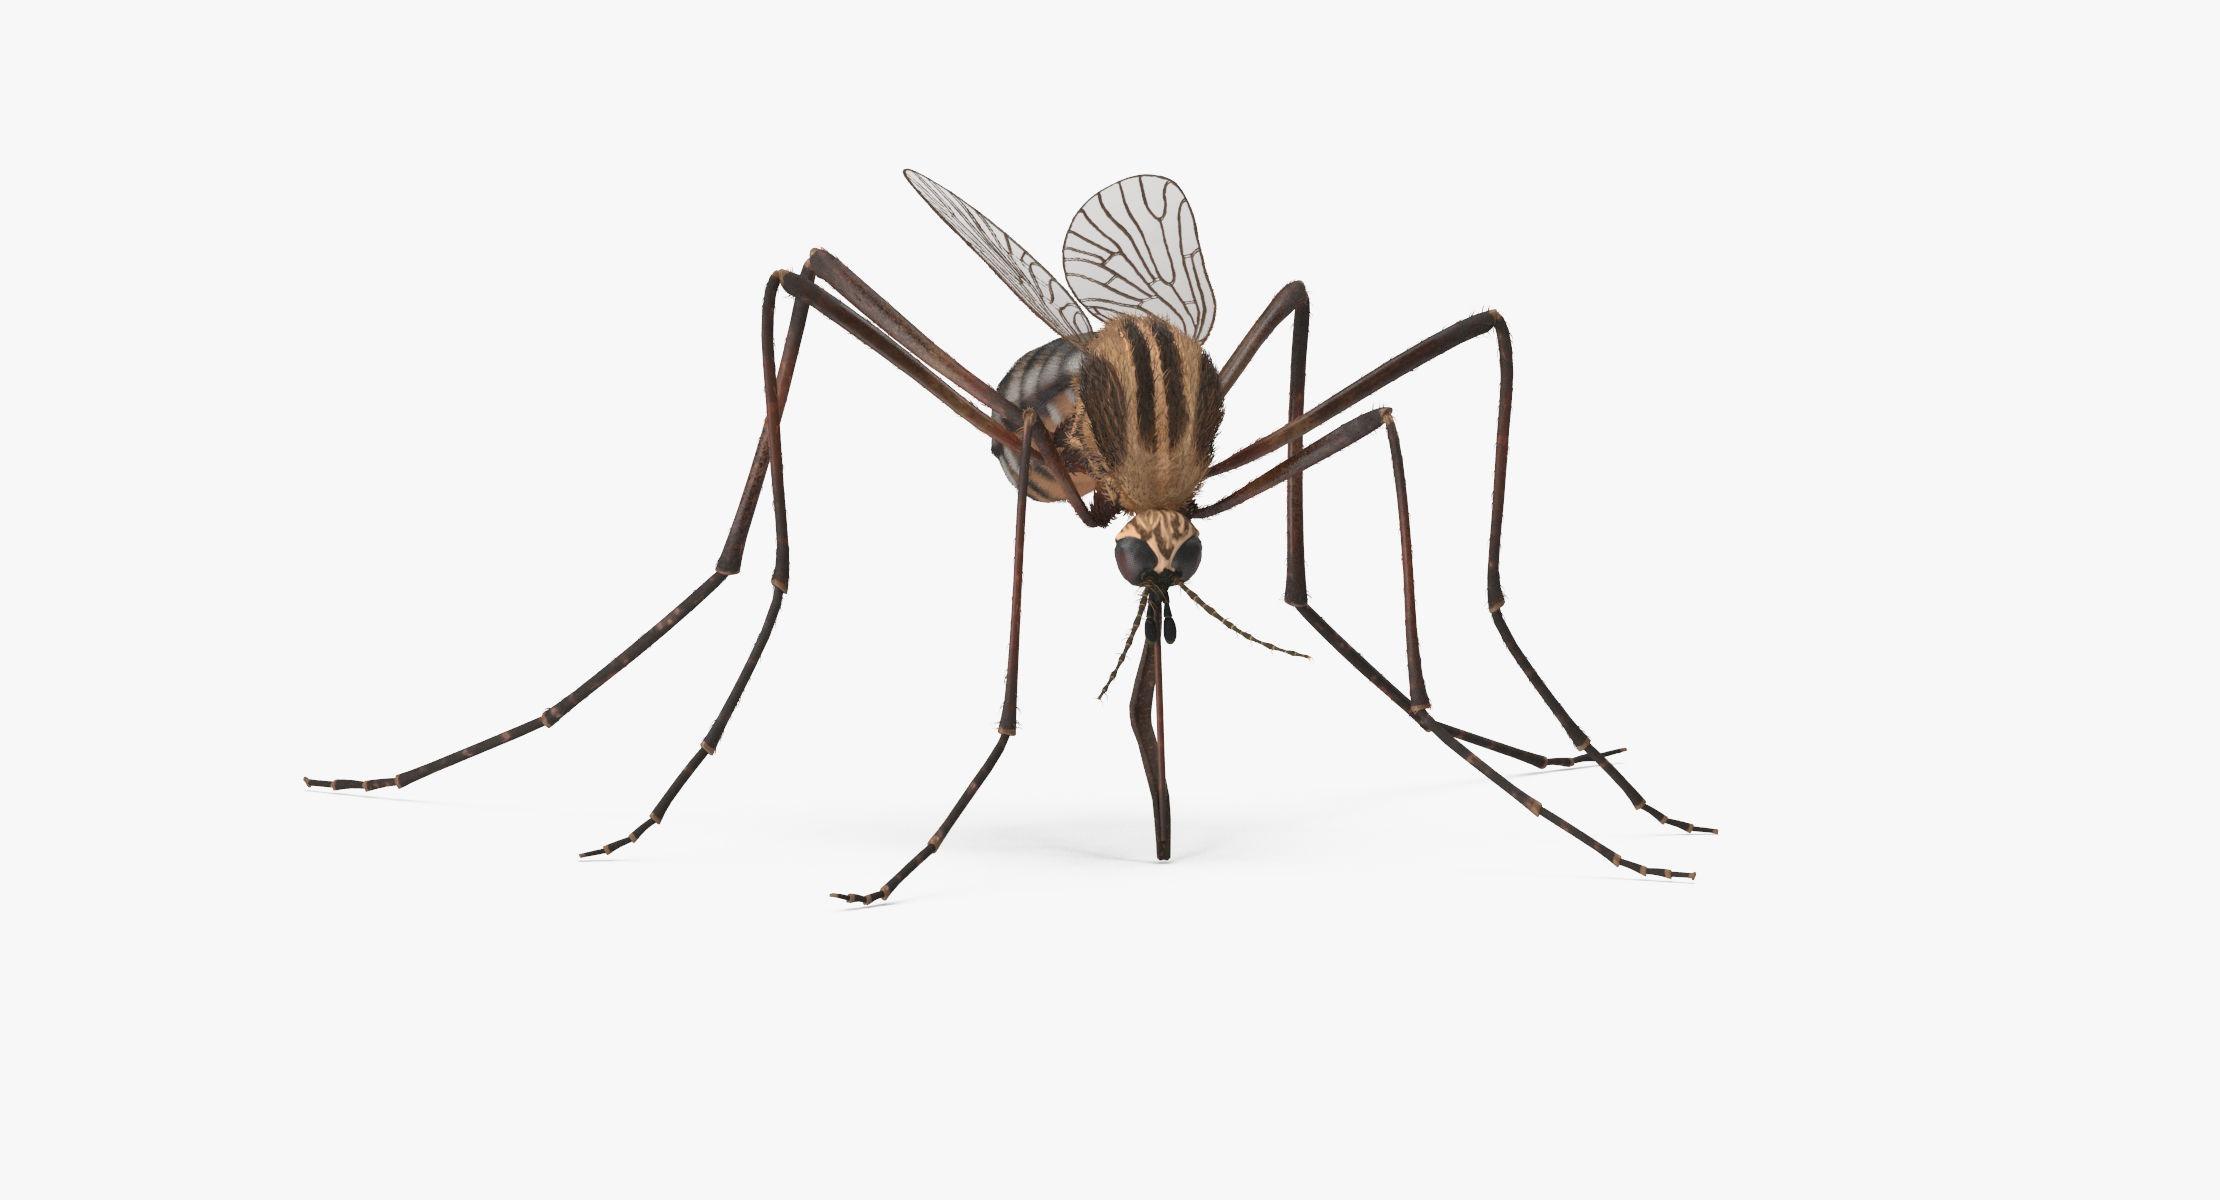 Mosquito Bloodsucking - reel 1